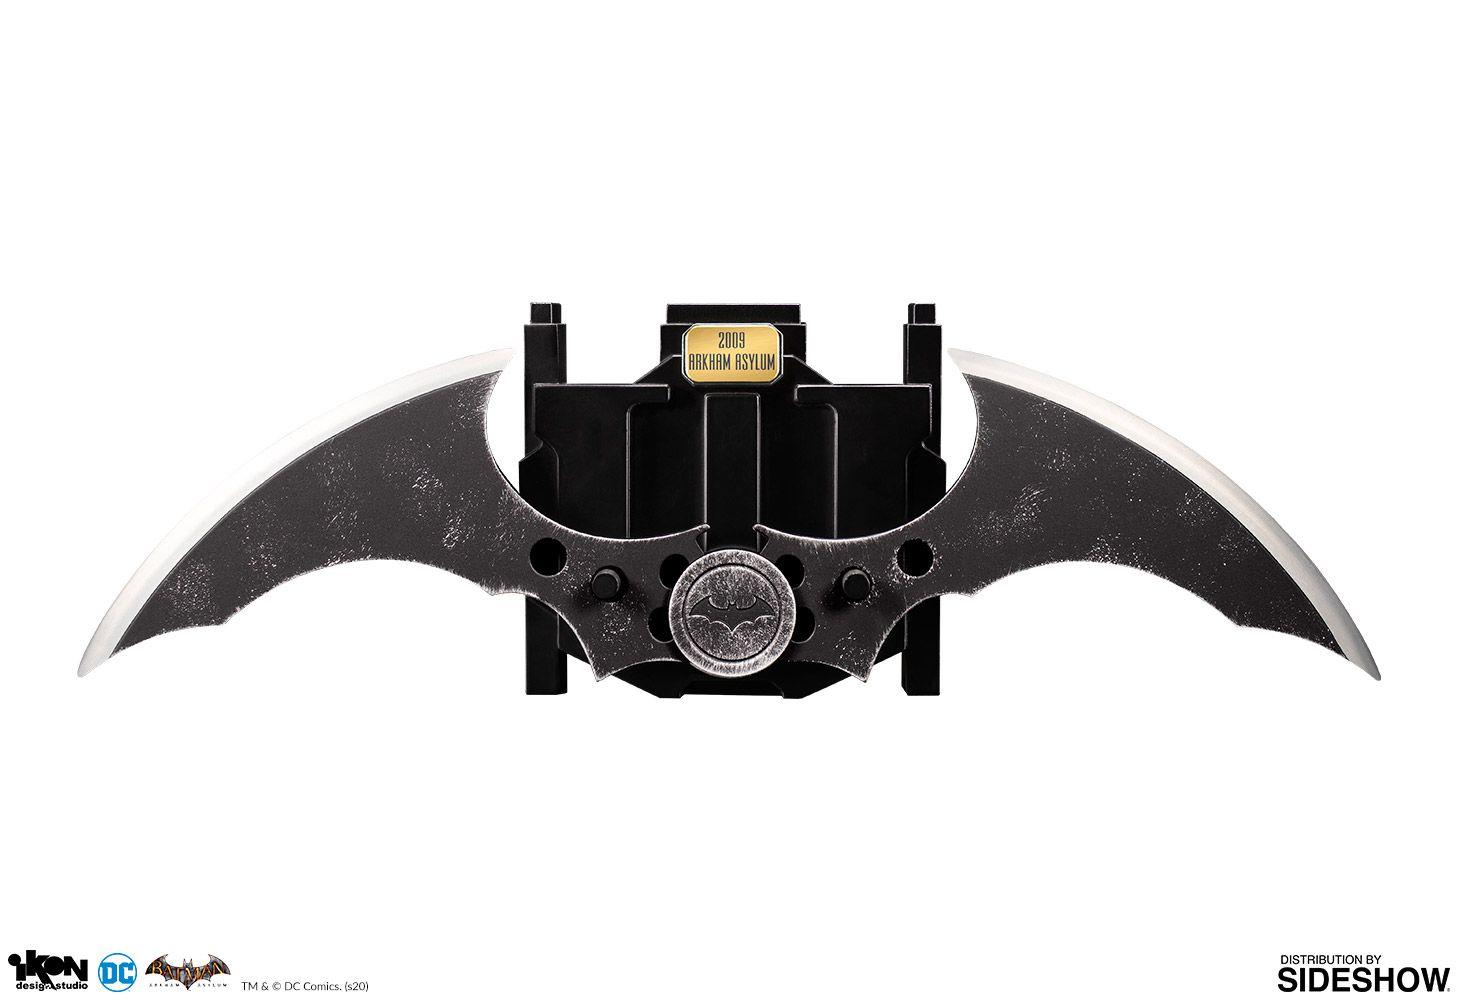 PRÉ VENDA: Réplica Batarang Die Cast: Batman Arkham Asylum - Ikon Design Studio